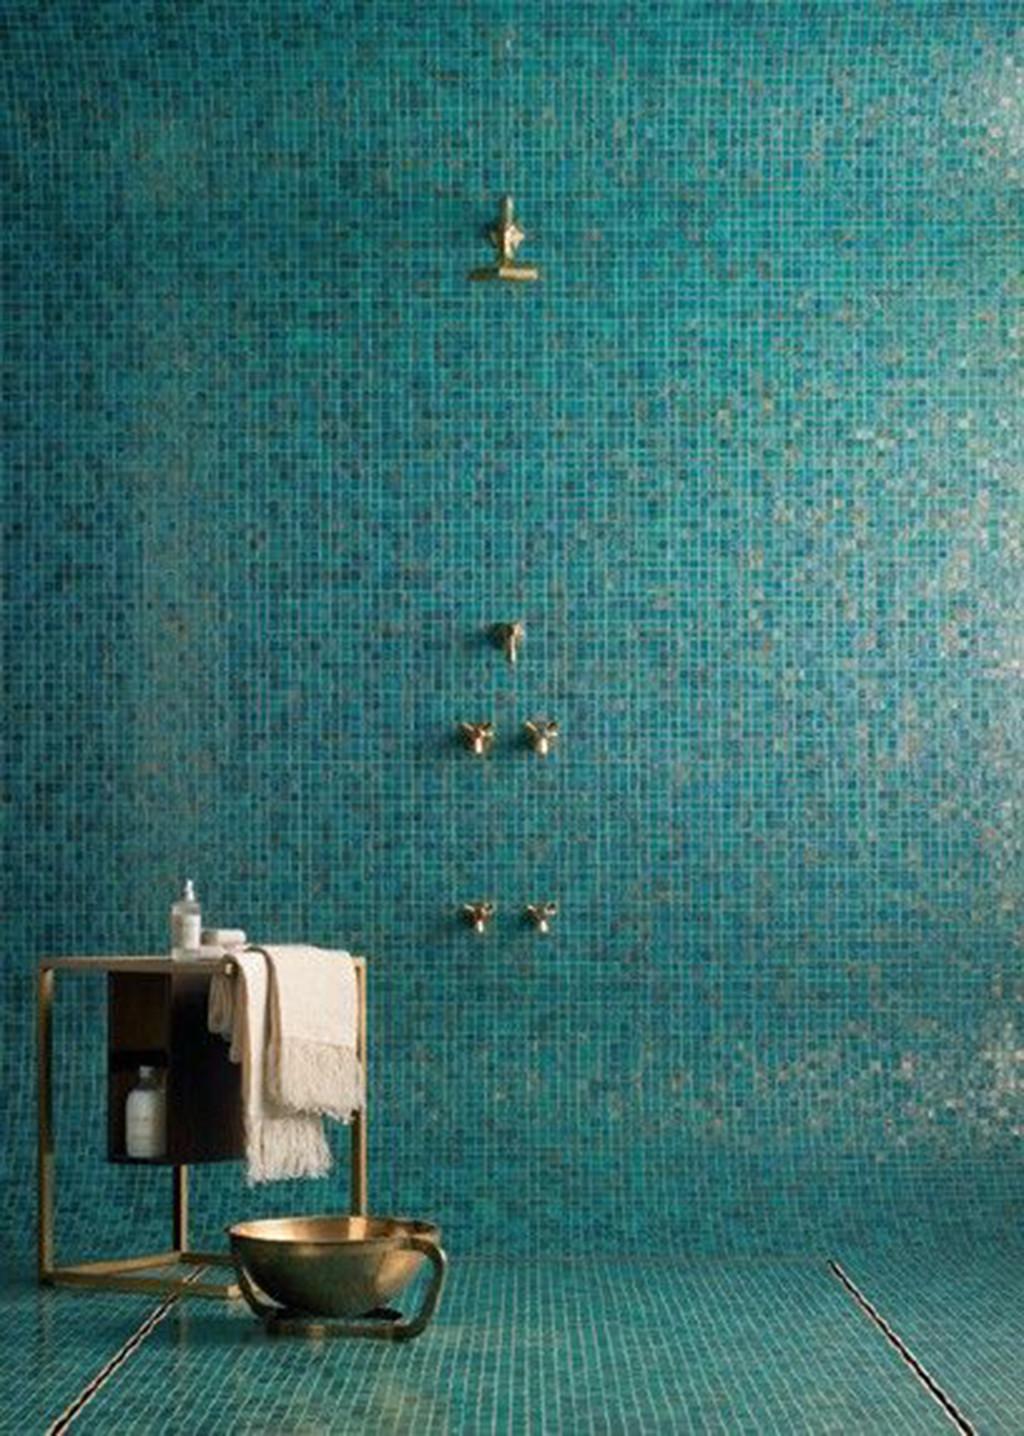 tegels-mozaiek-blauw-omg_2048x2048.jpg